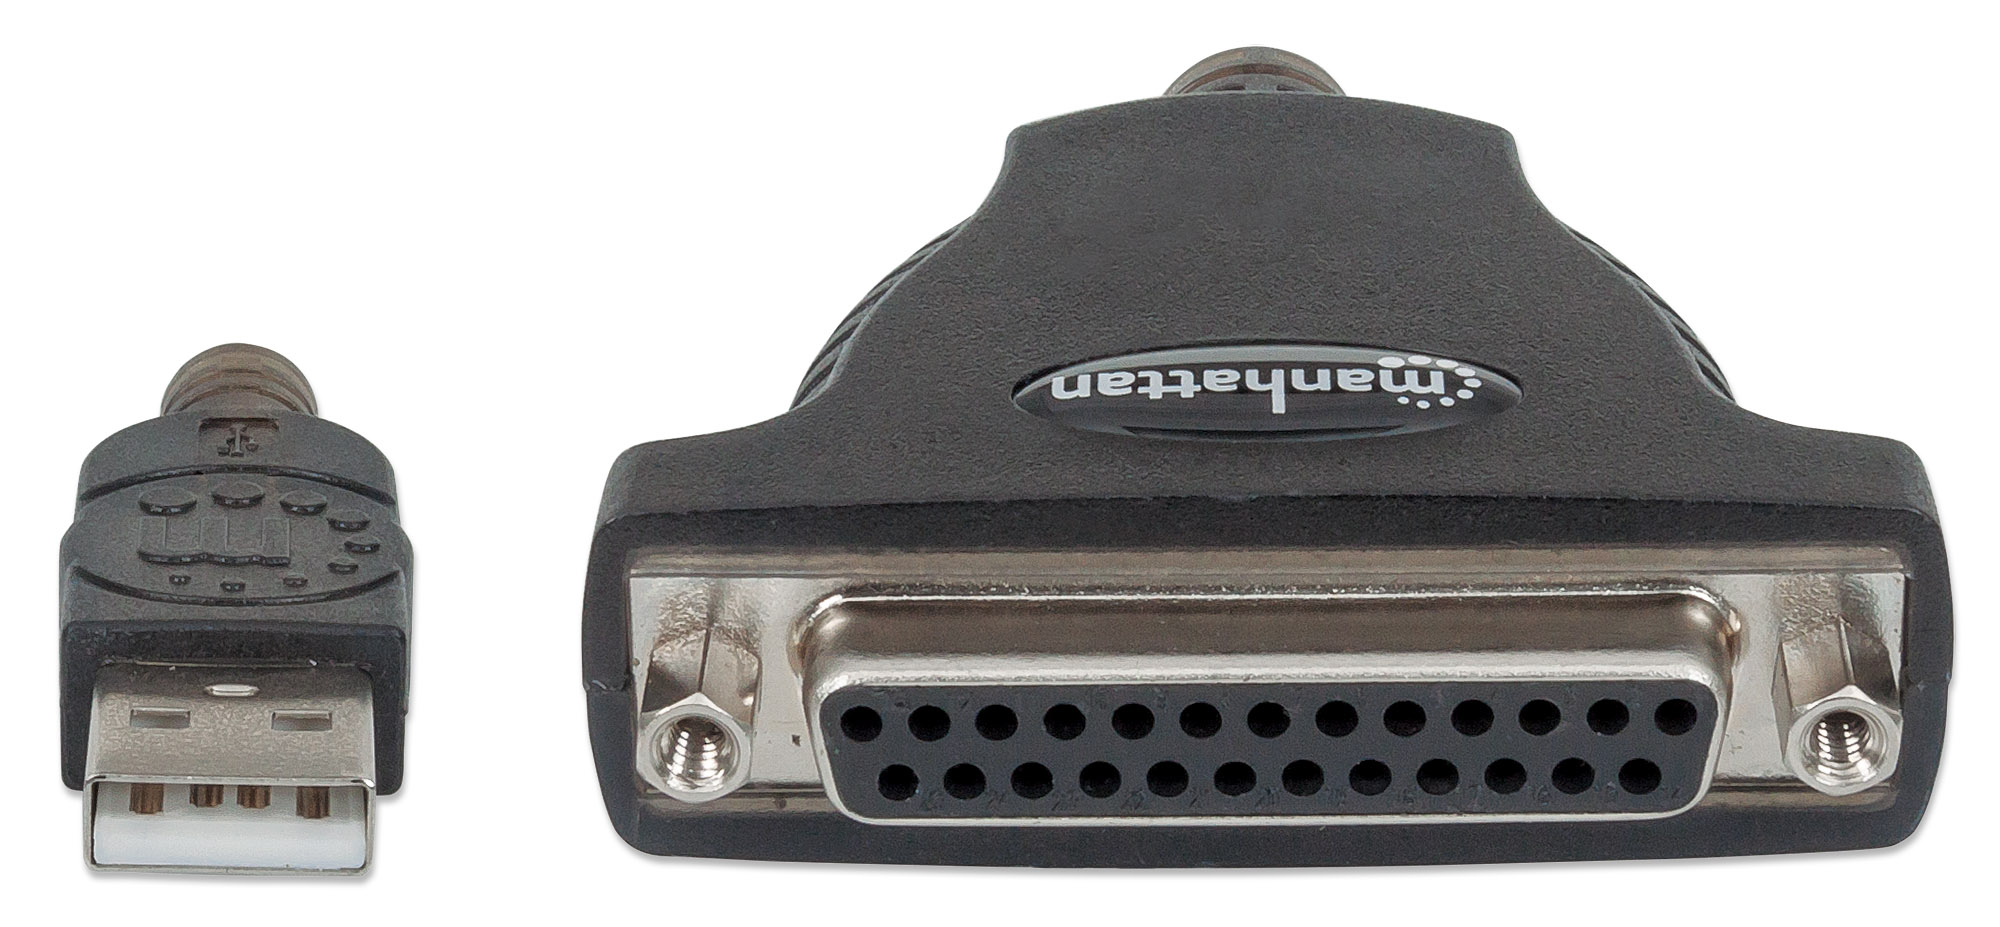 Full-Speed USB to DB25 Parallel Printer Converter